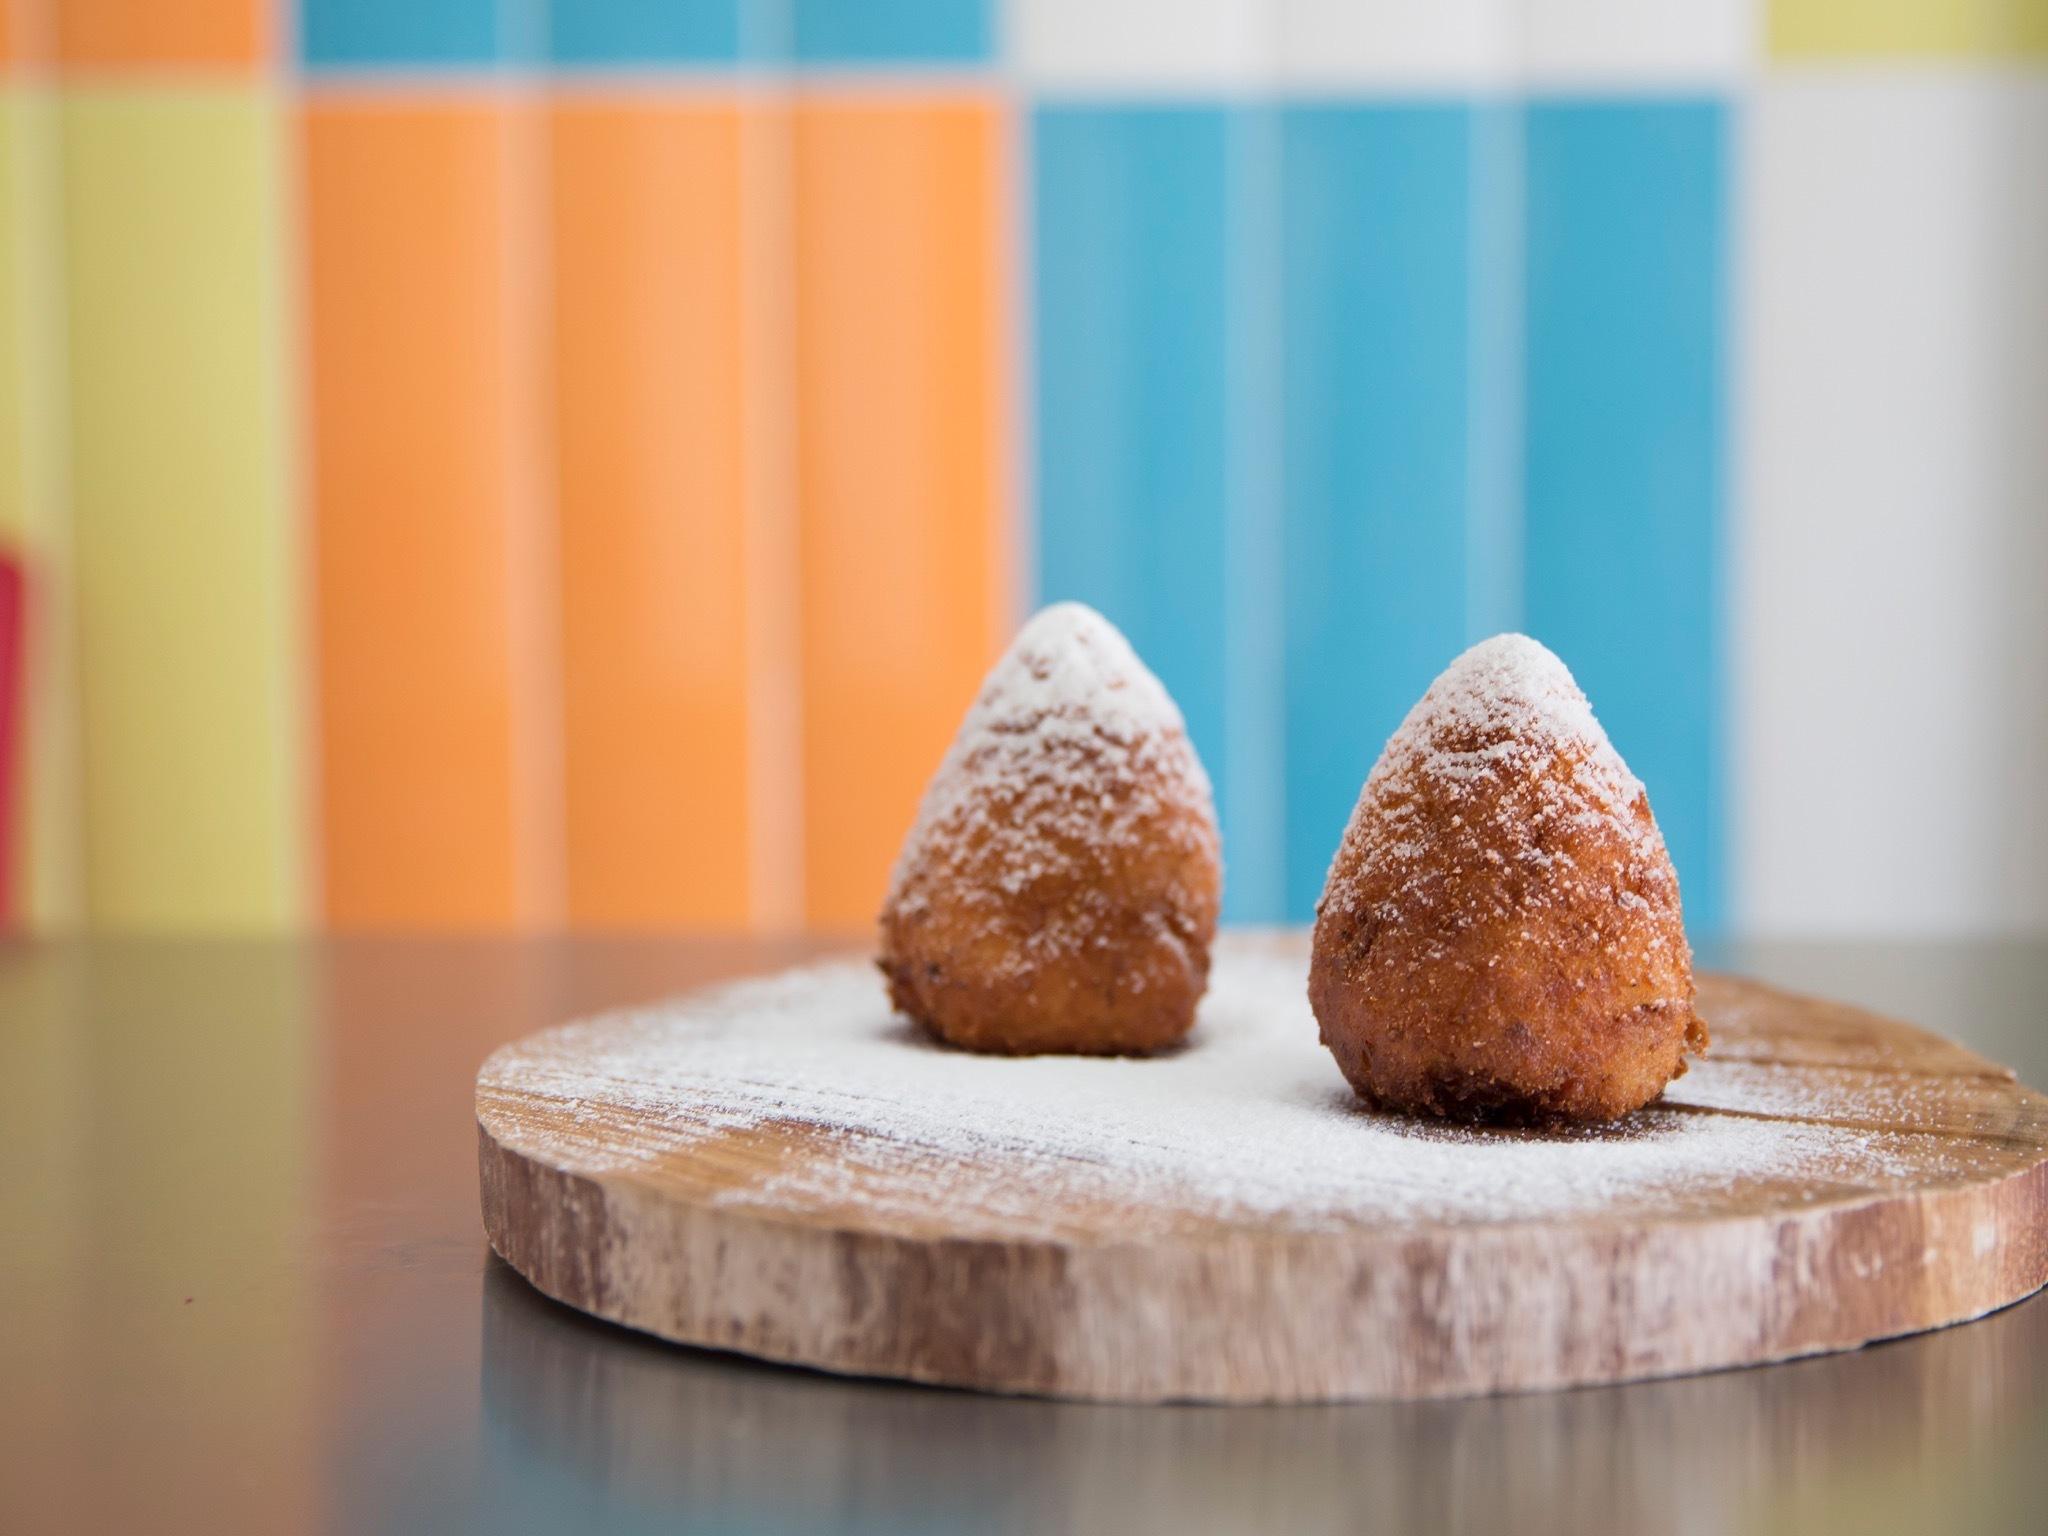 Sweet aranchinis sprinkled sith icing sugar